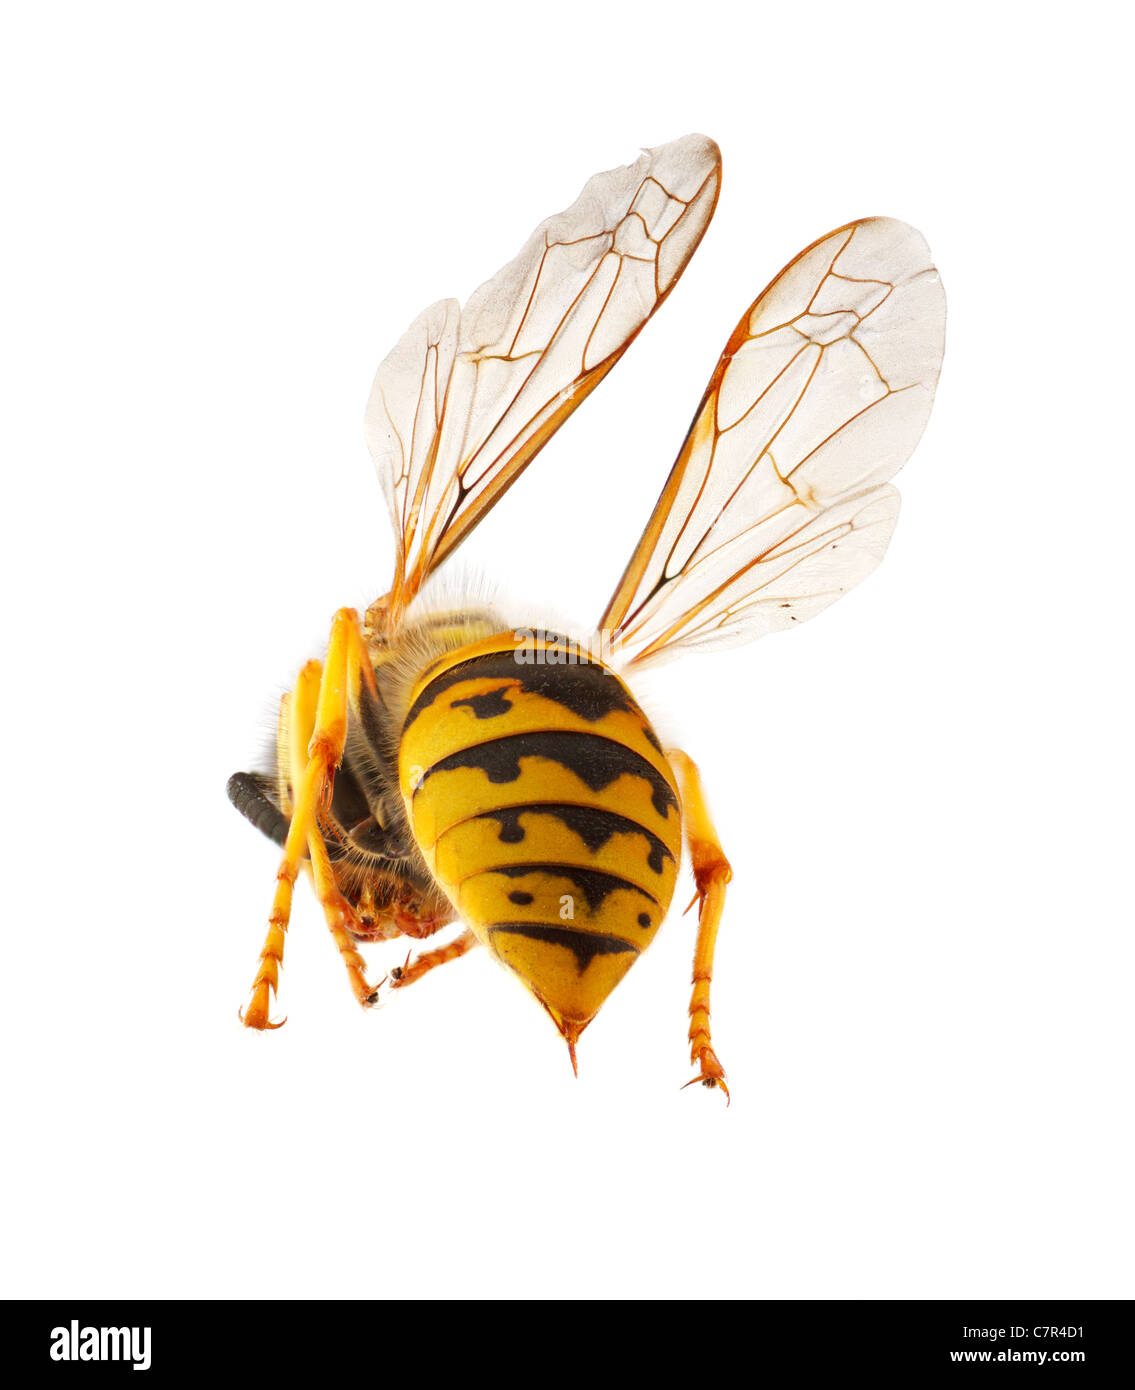 Wasp presentándolo en el abdomen con aguijón, amenazando con enfoque macro apiladas, concepto aislado Imagen De Stock